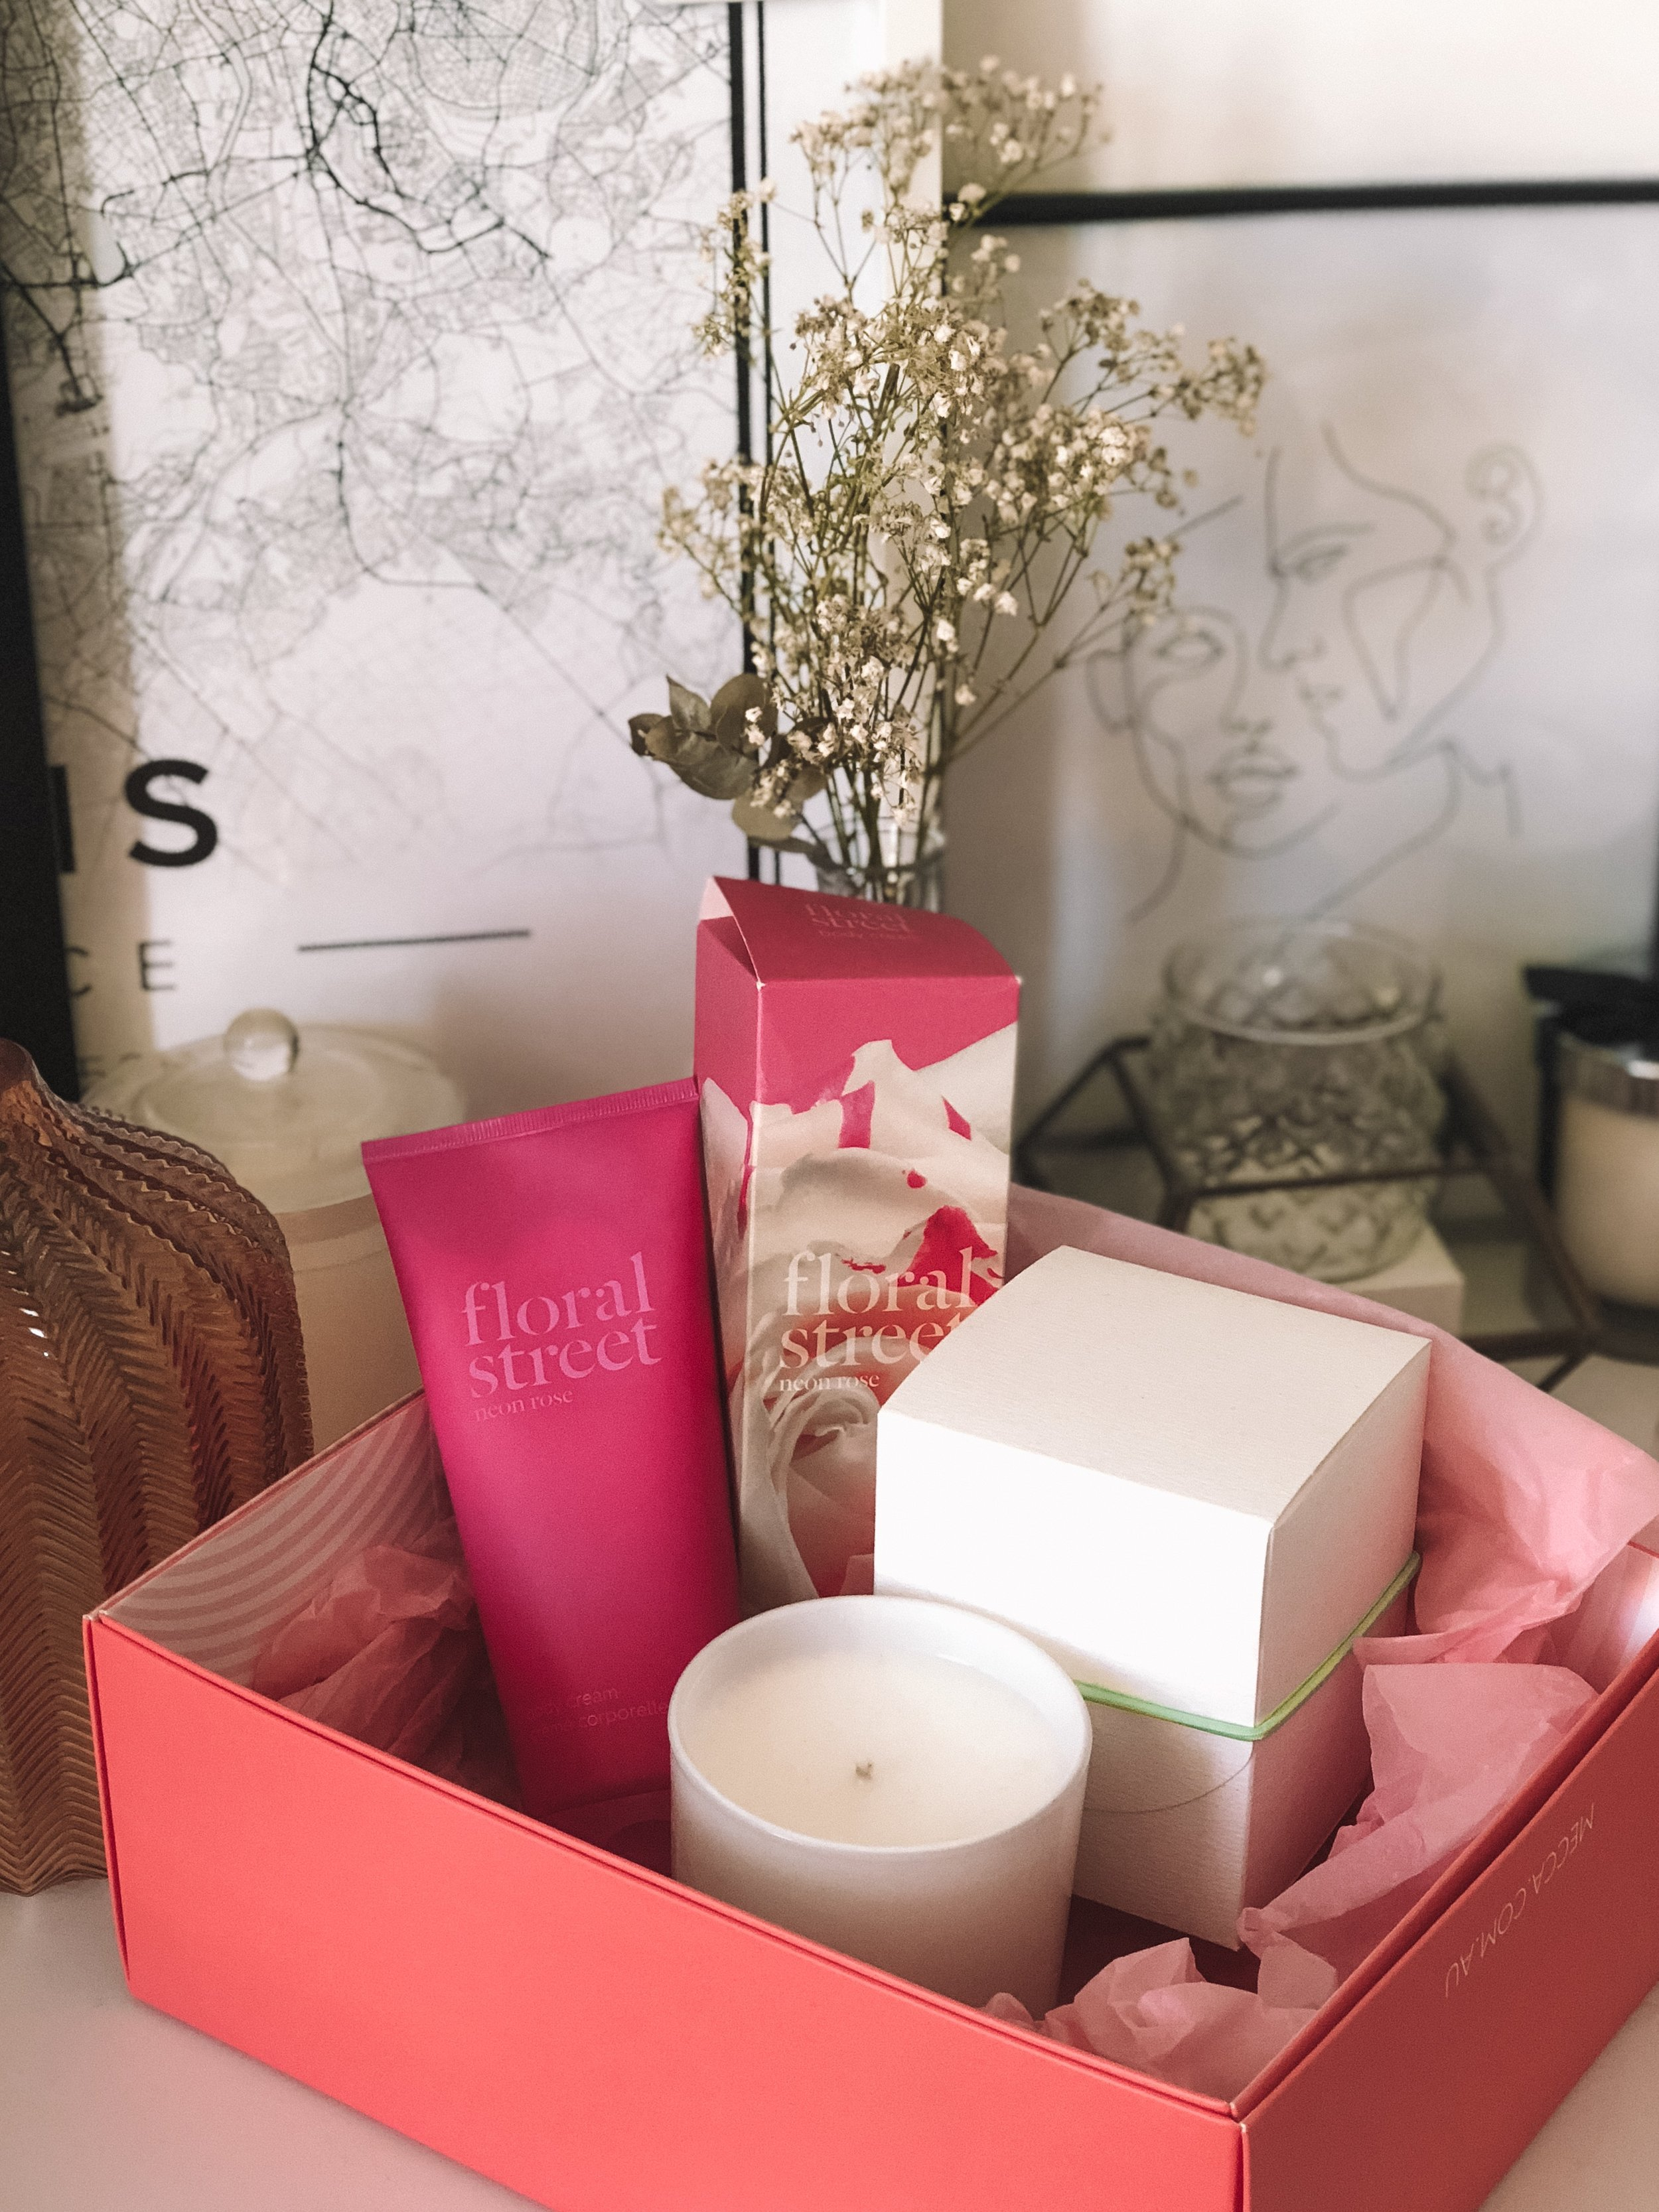 MECCA - New Brand Floral Street